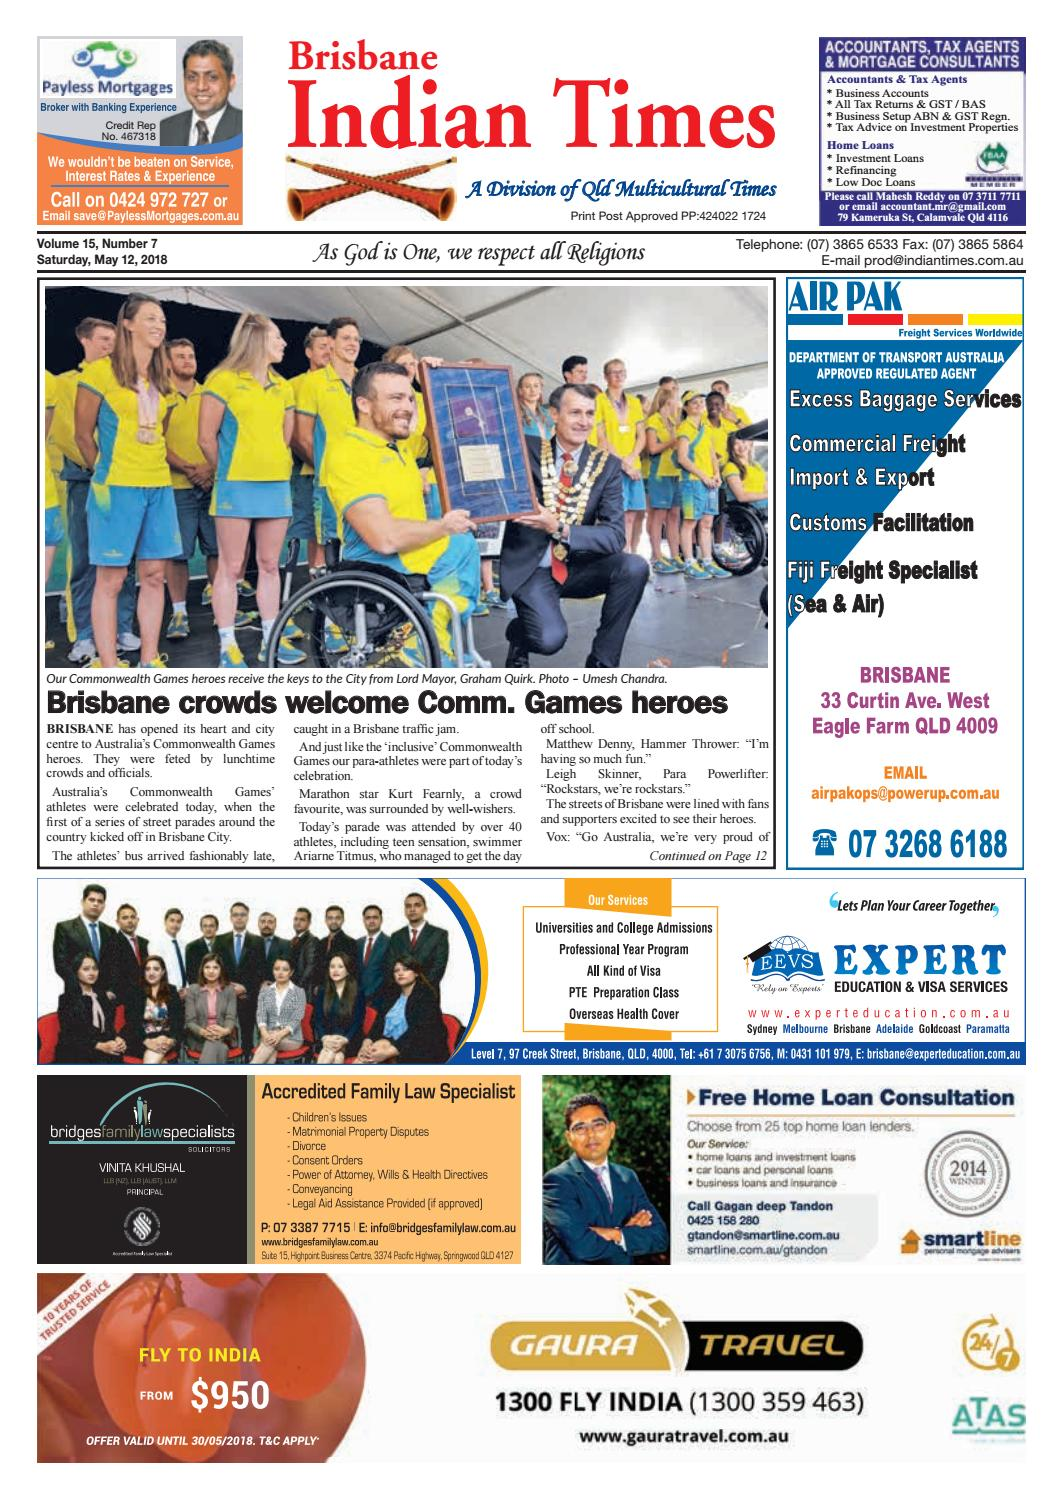 Brisbane Indian Times - May 2018 by Umesh Chandra - issuu